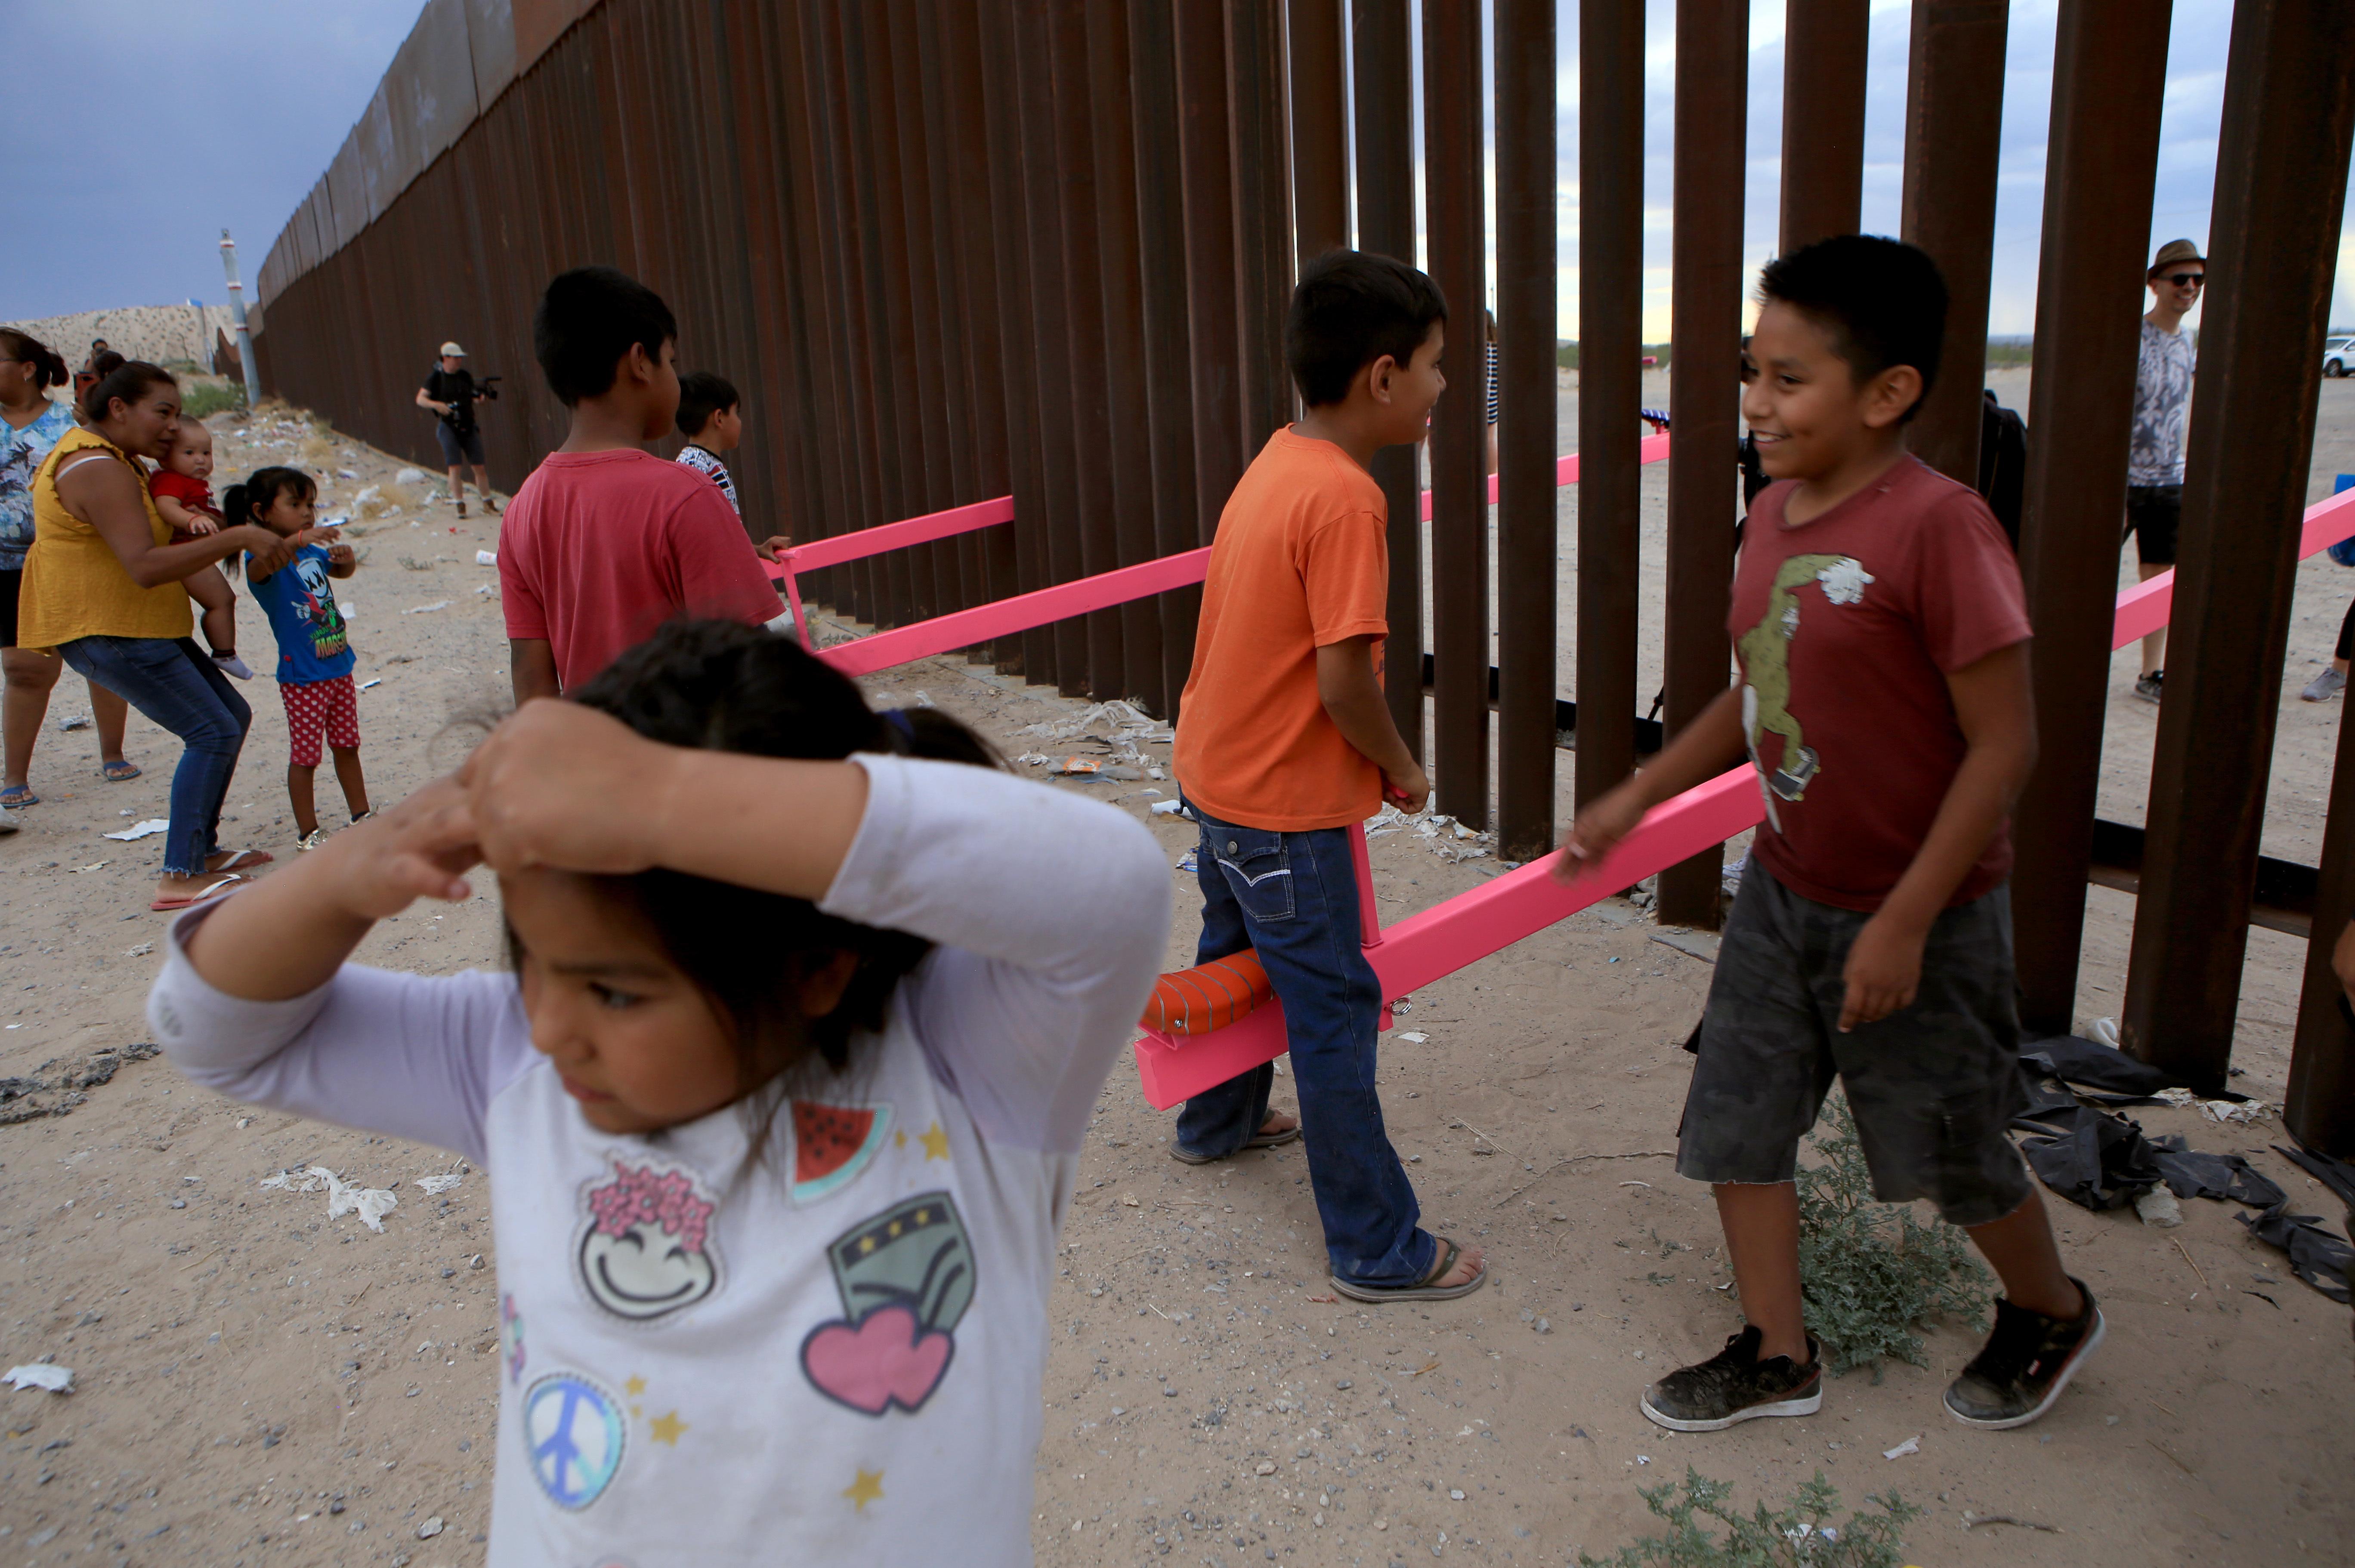 Seesaws Built On U S Border Wall Win Prestigious Design Prize Npr